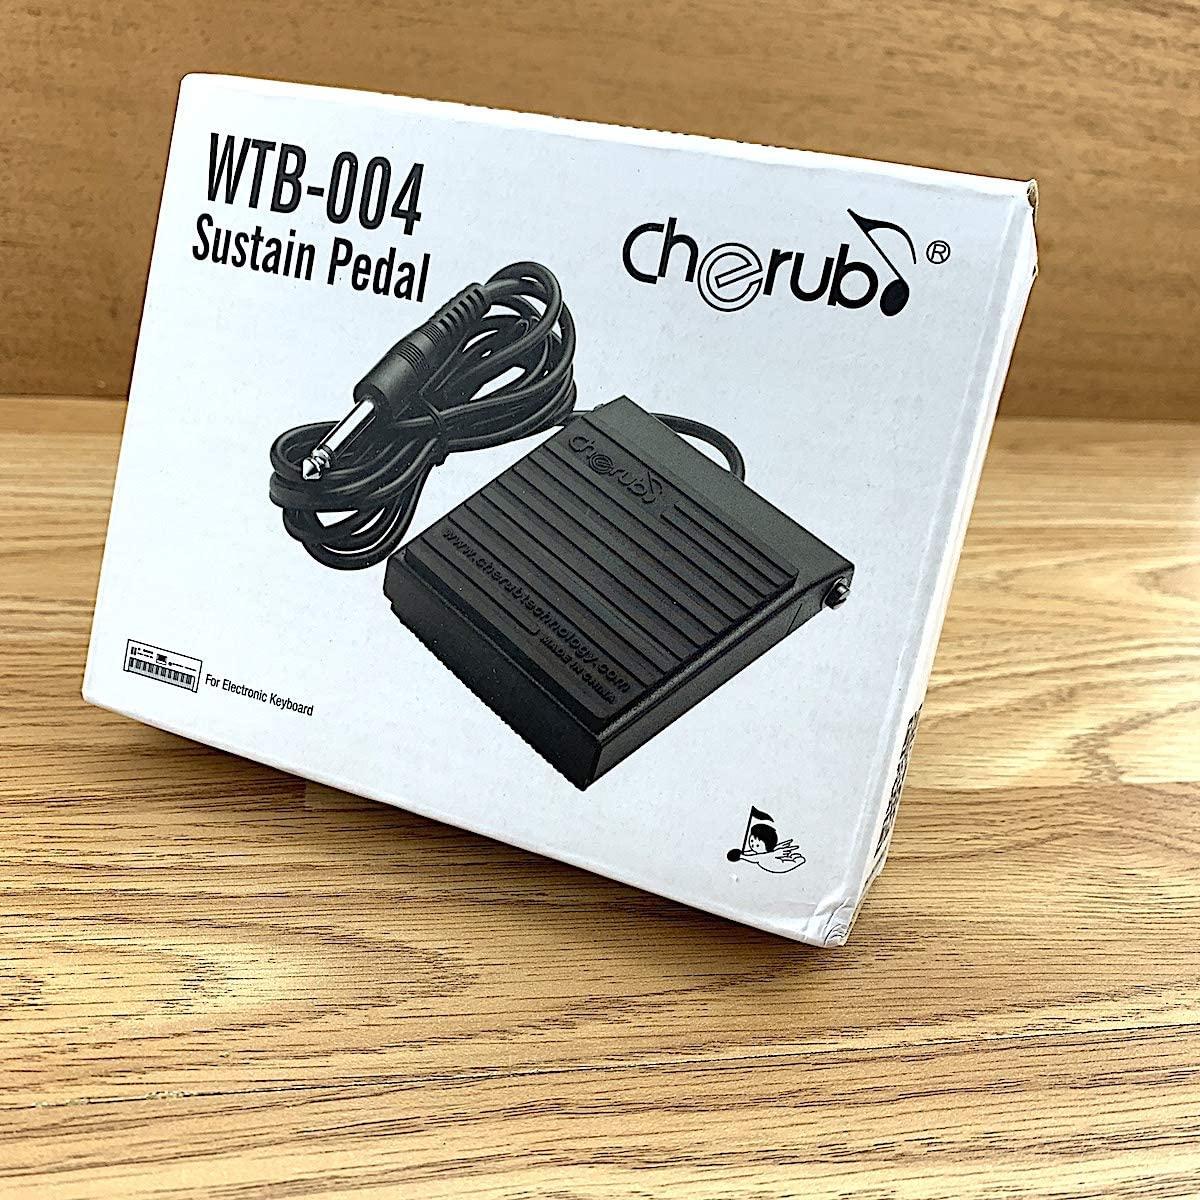 Cherub Digital Keyboard Sustain Pedal WTB-004